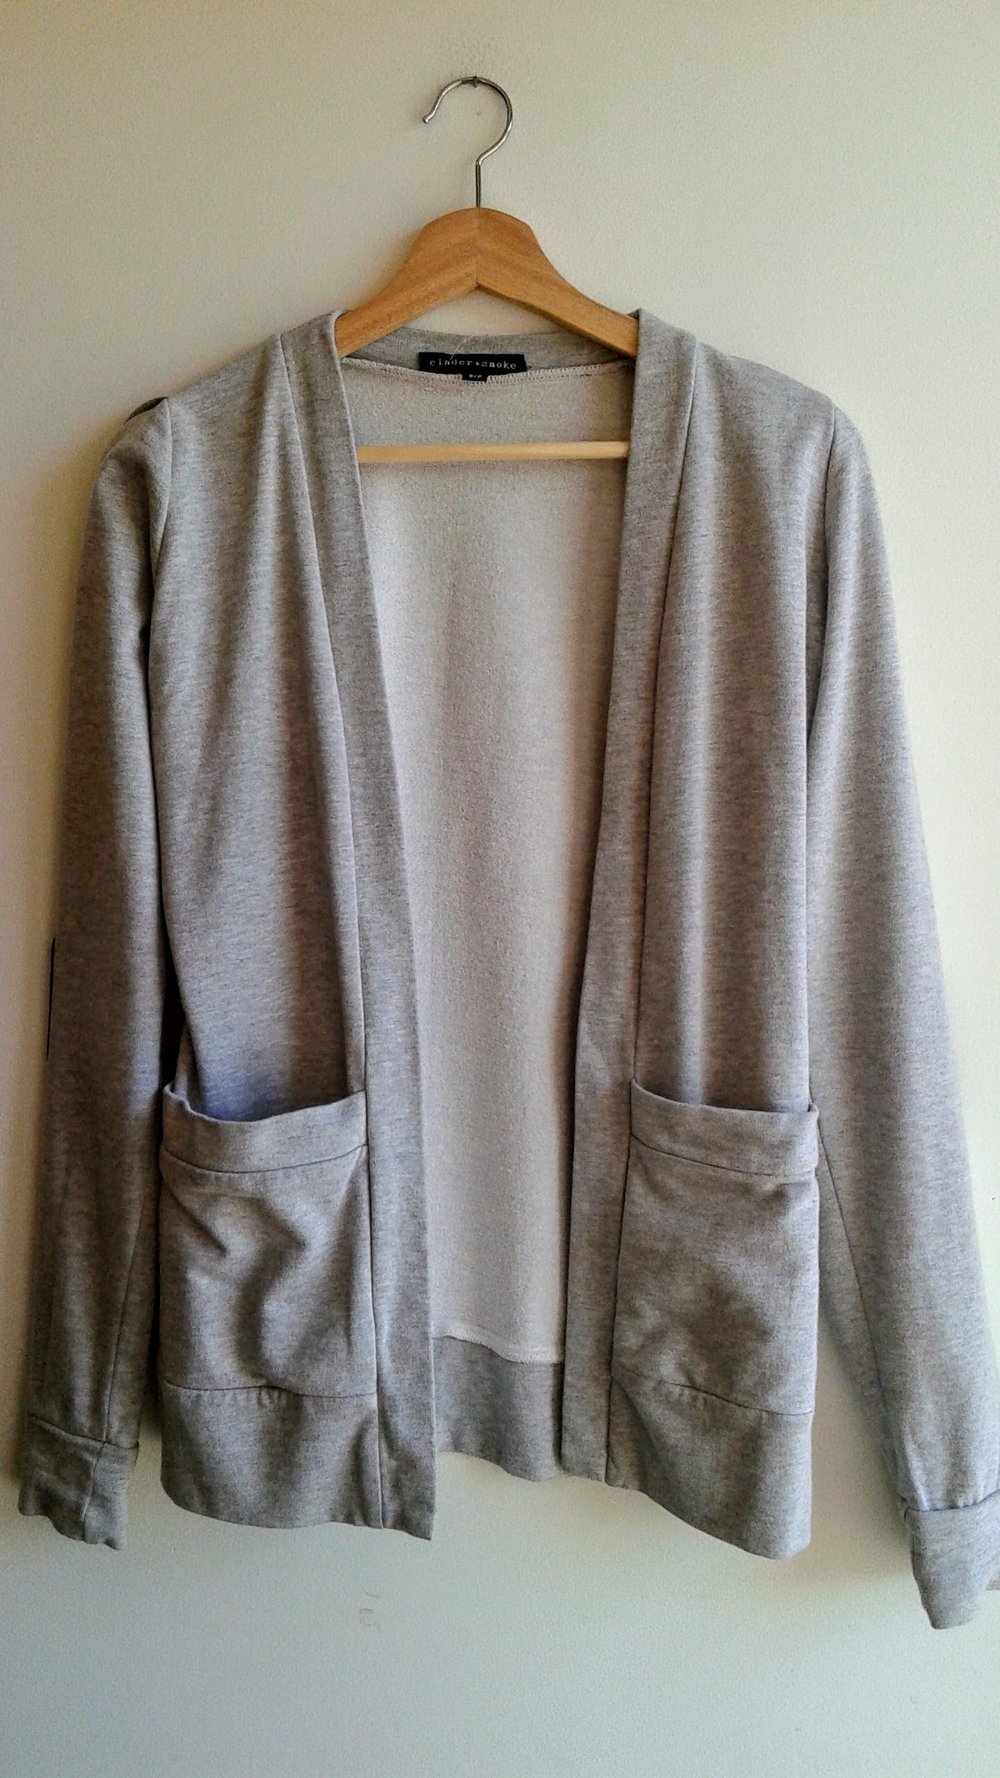 Cinder+Smoke sweater; Size S, $30